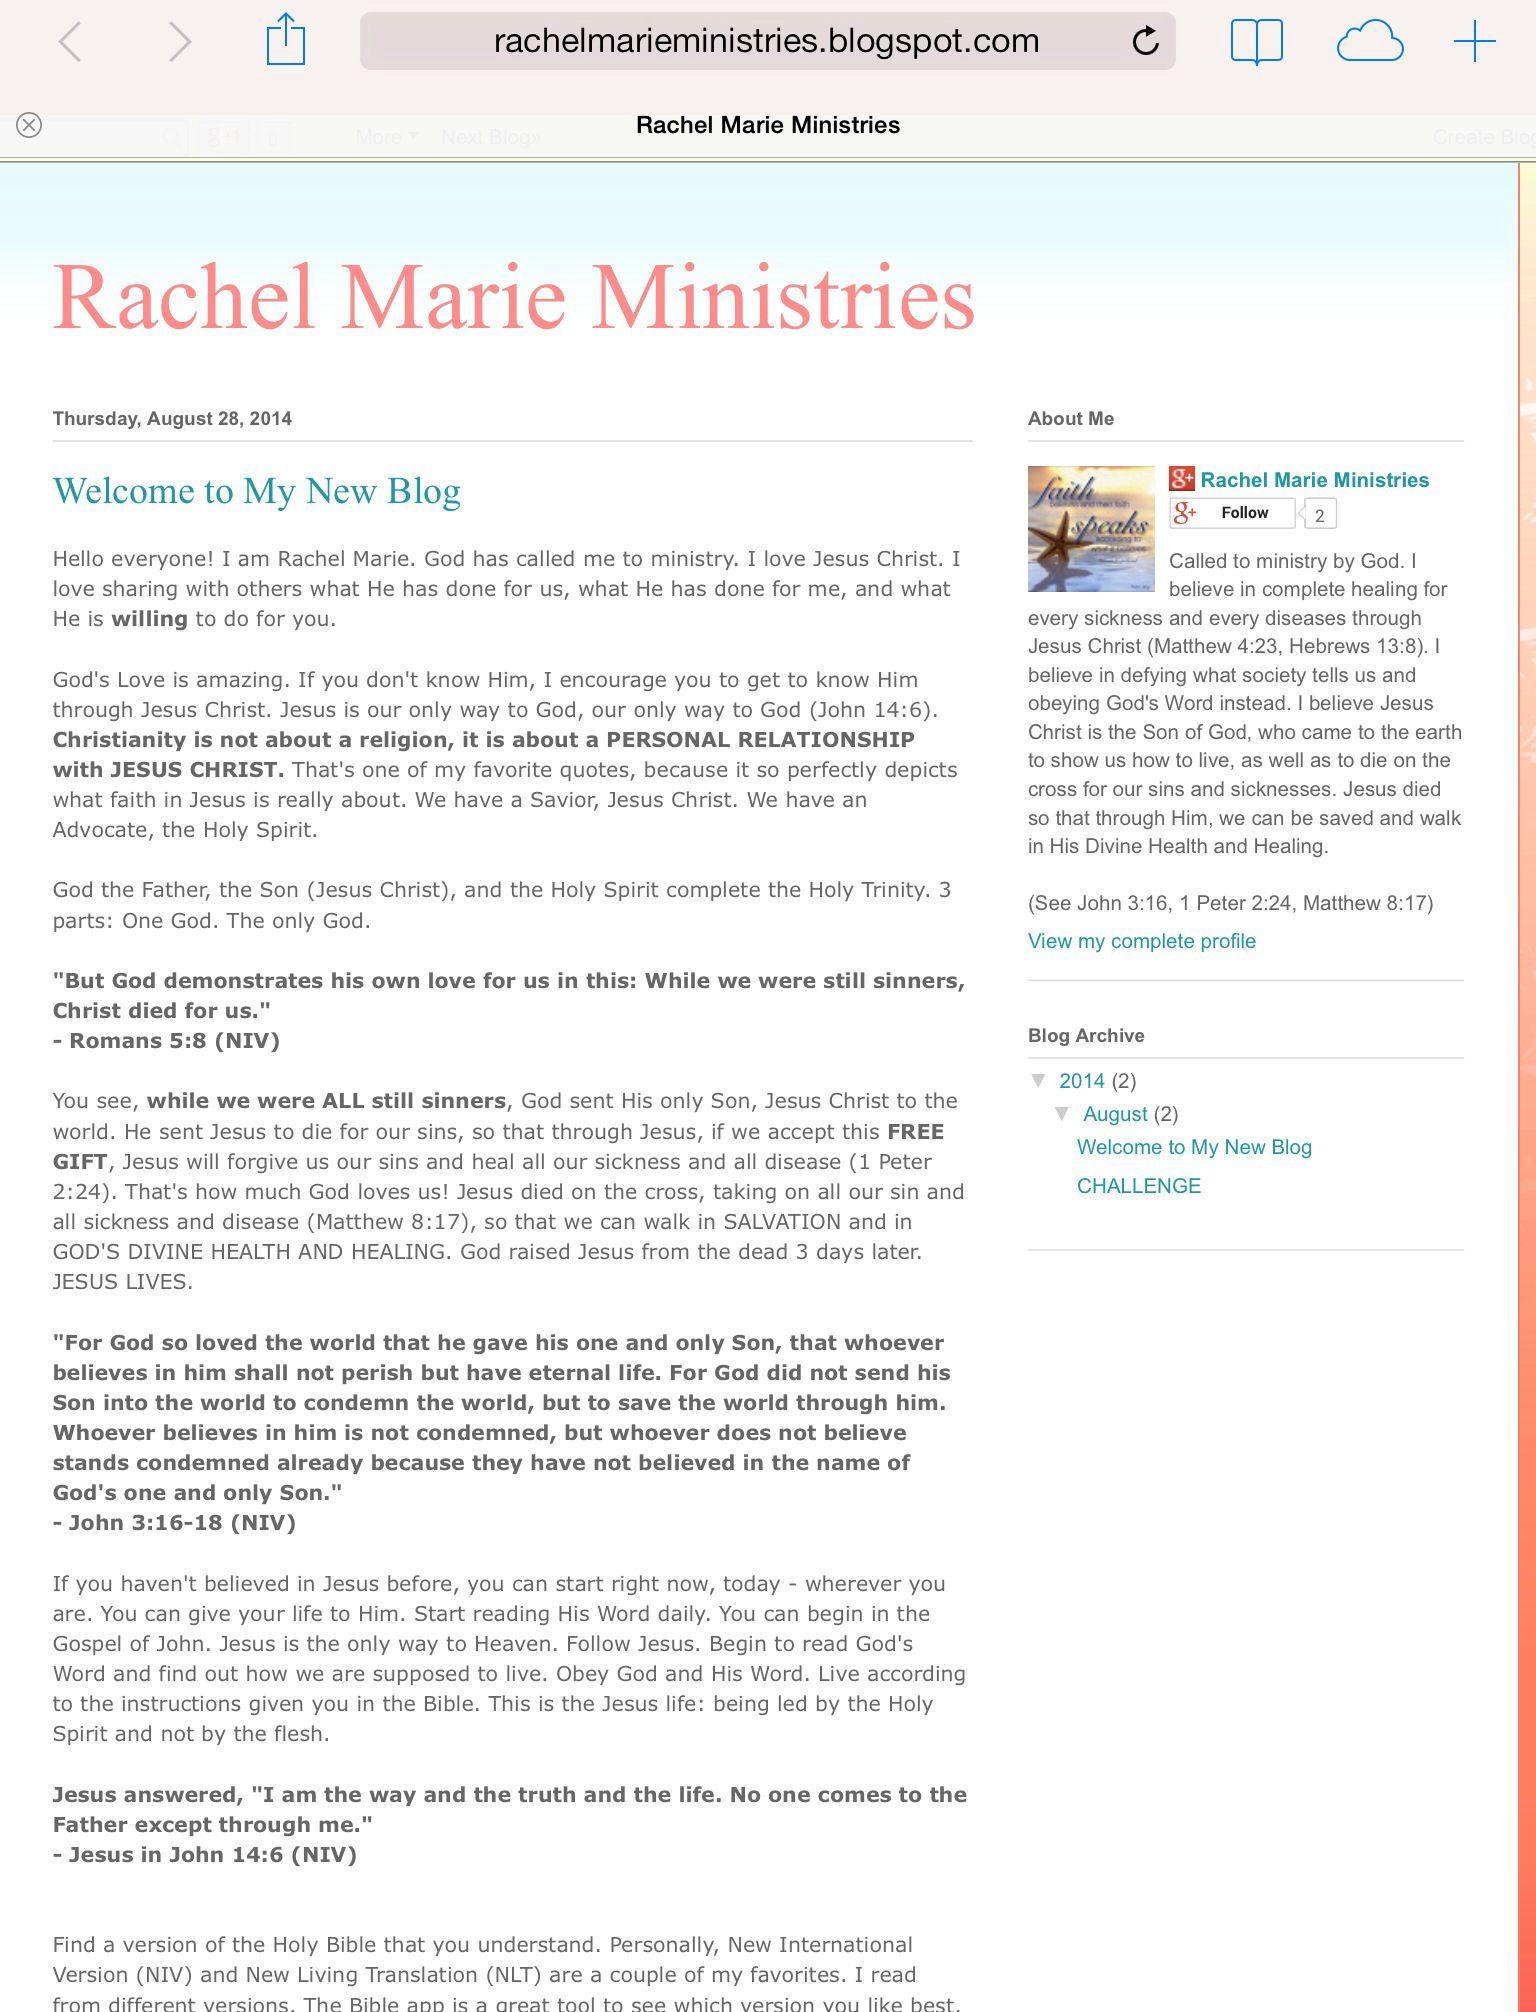 RachelMarieMinistries.blogspot.com  Welcome to my new blog :)